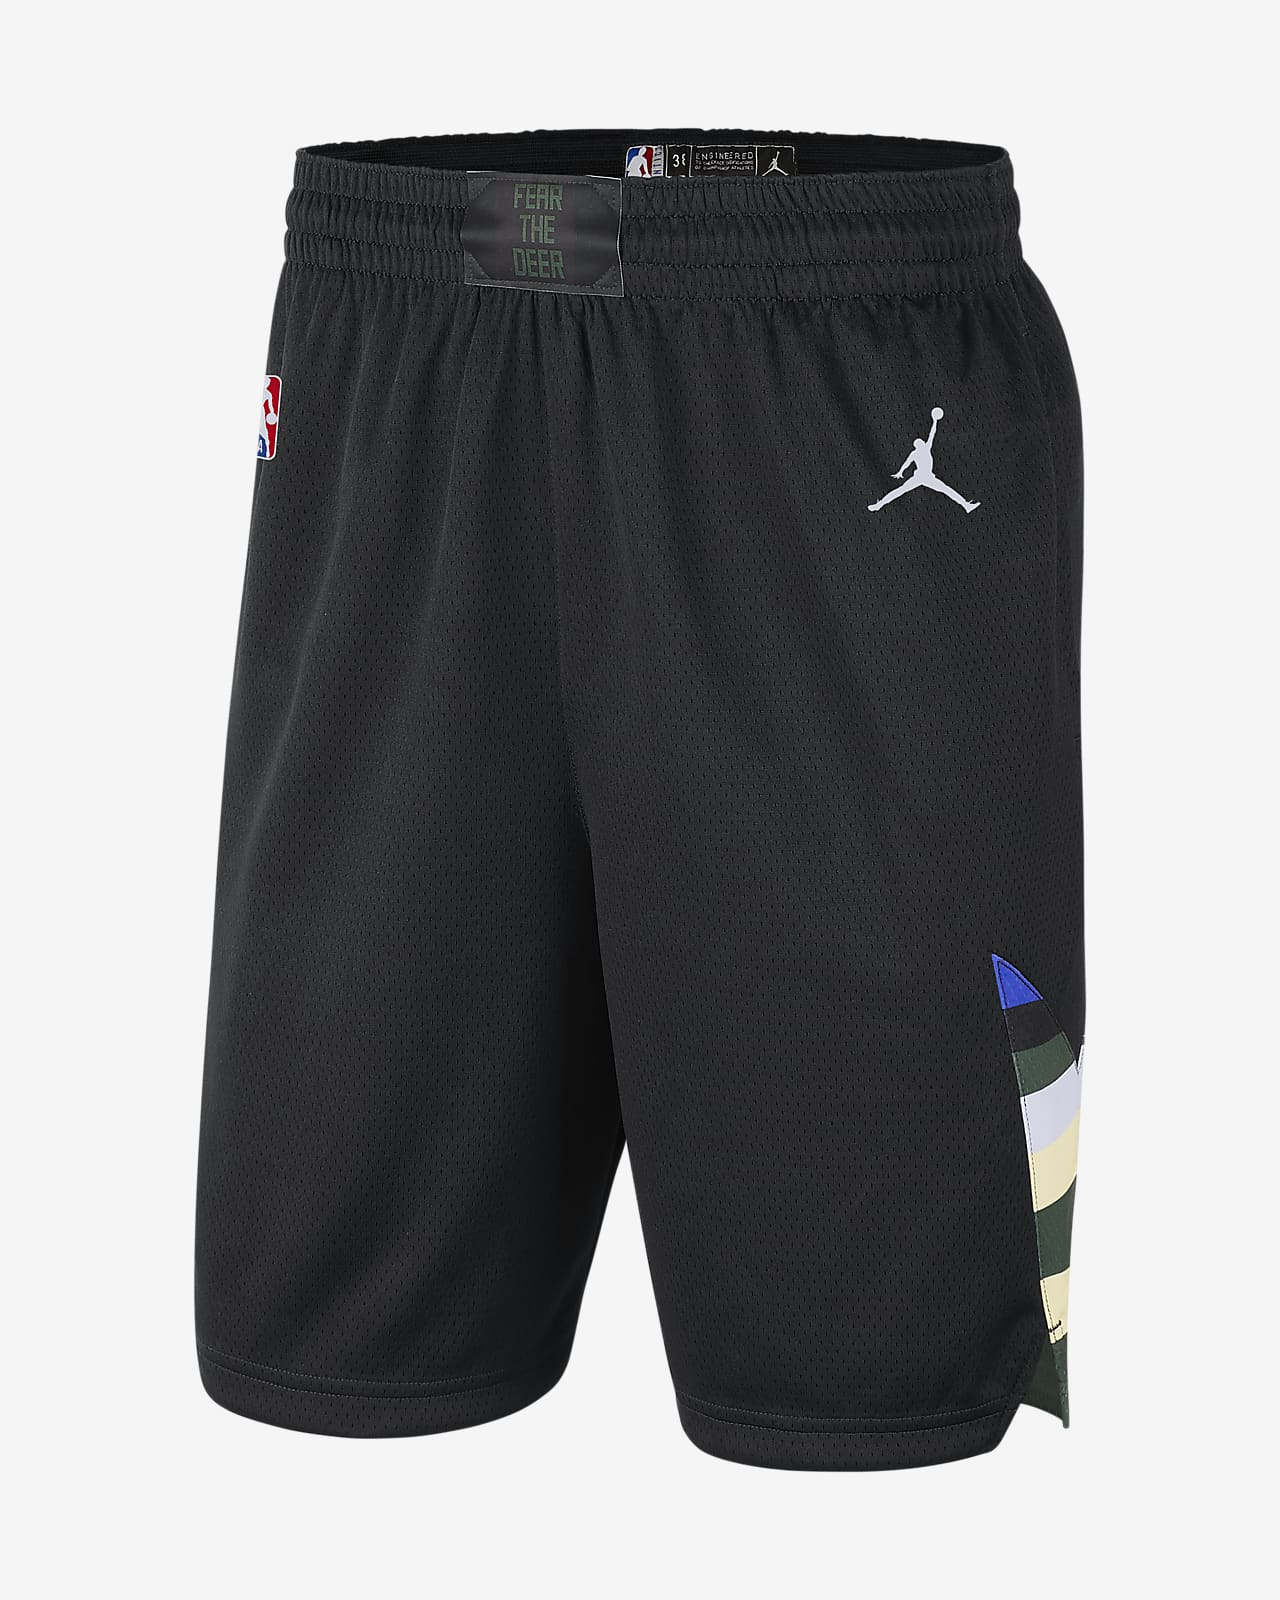 Bucks Statement Edition 2020 Pantalón corto Jordan NBA Swingman - Hombre